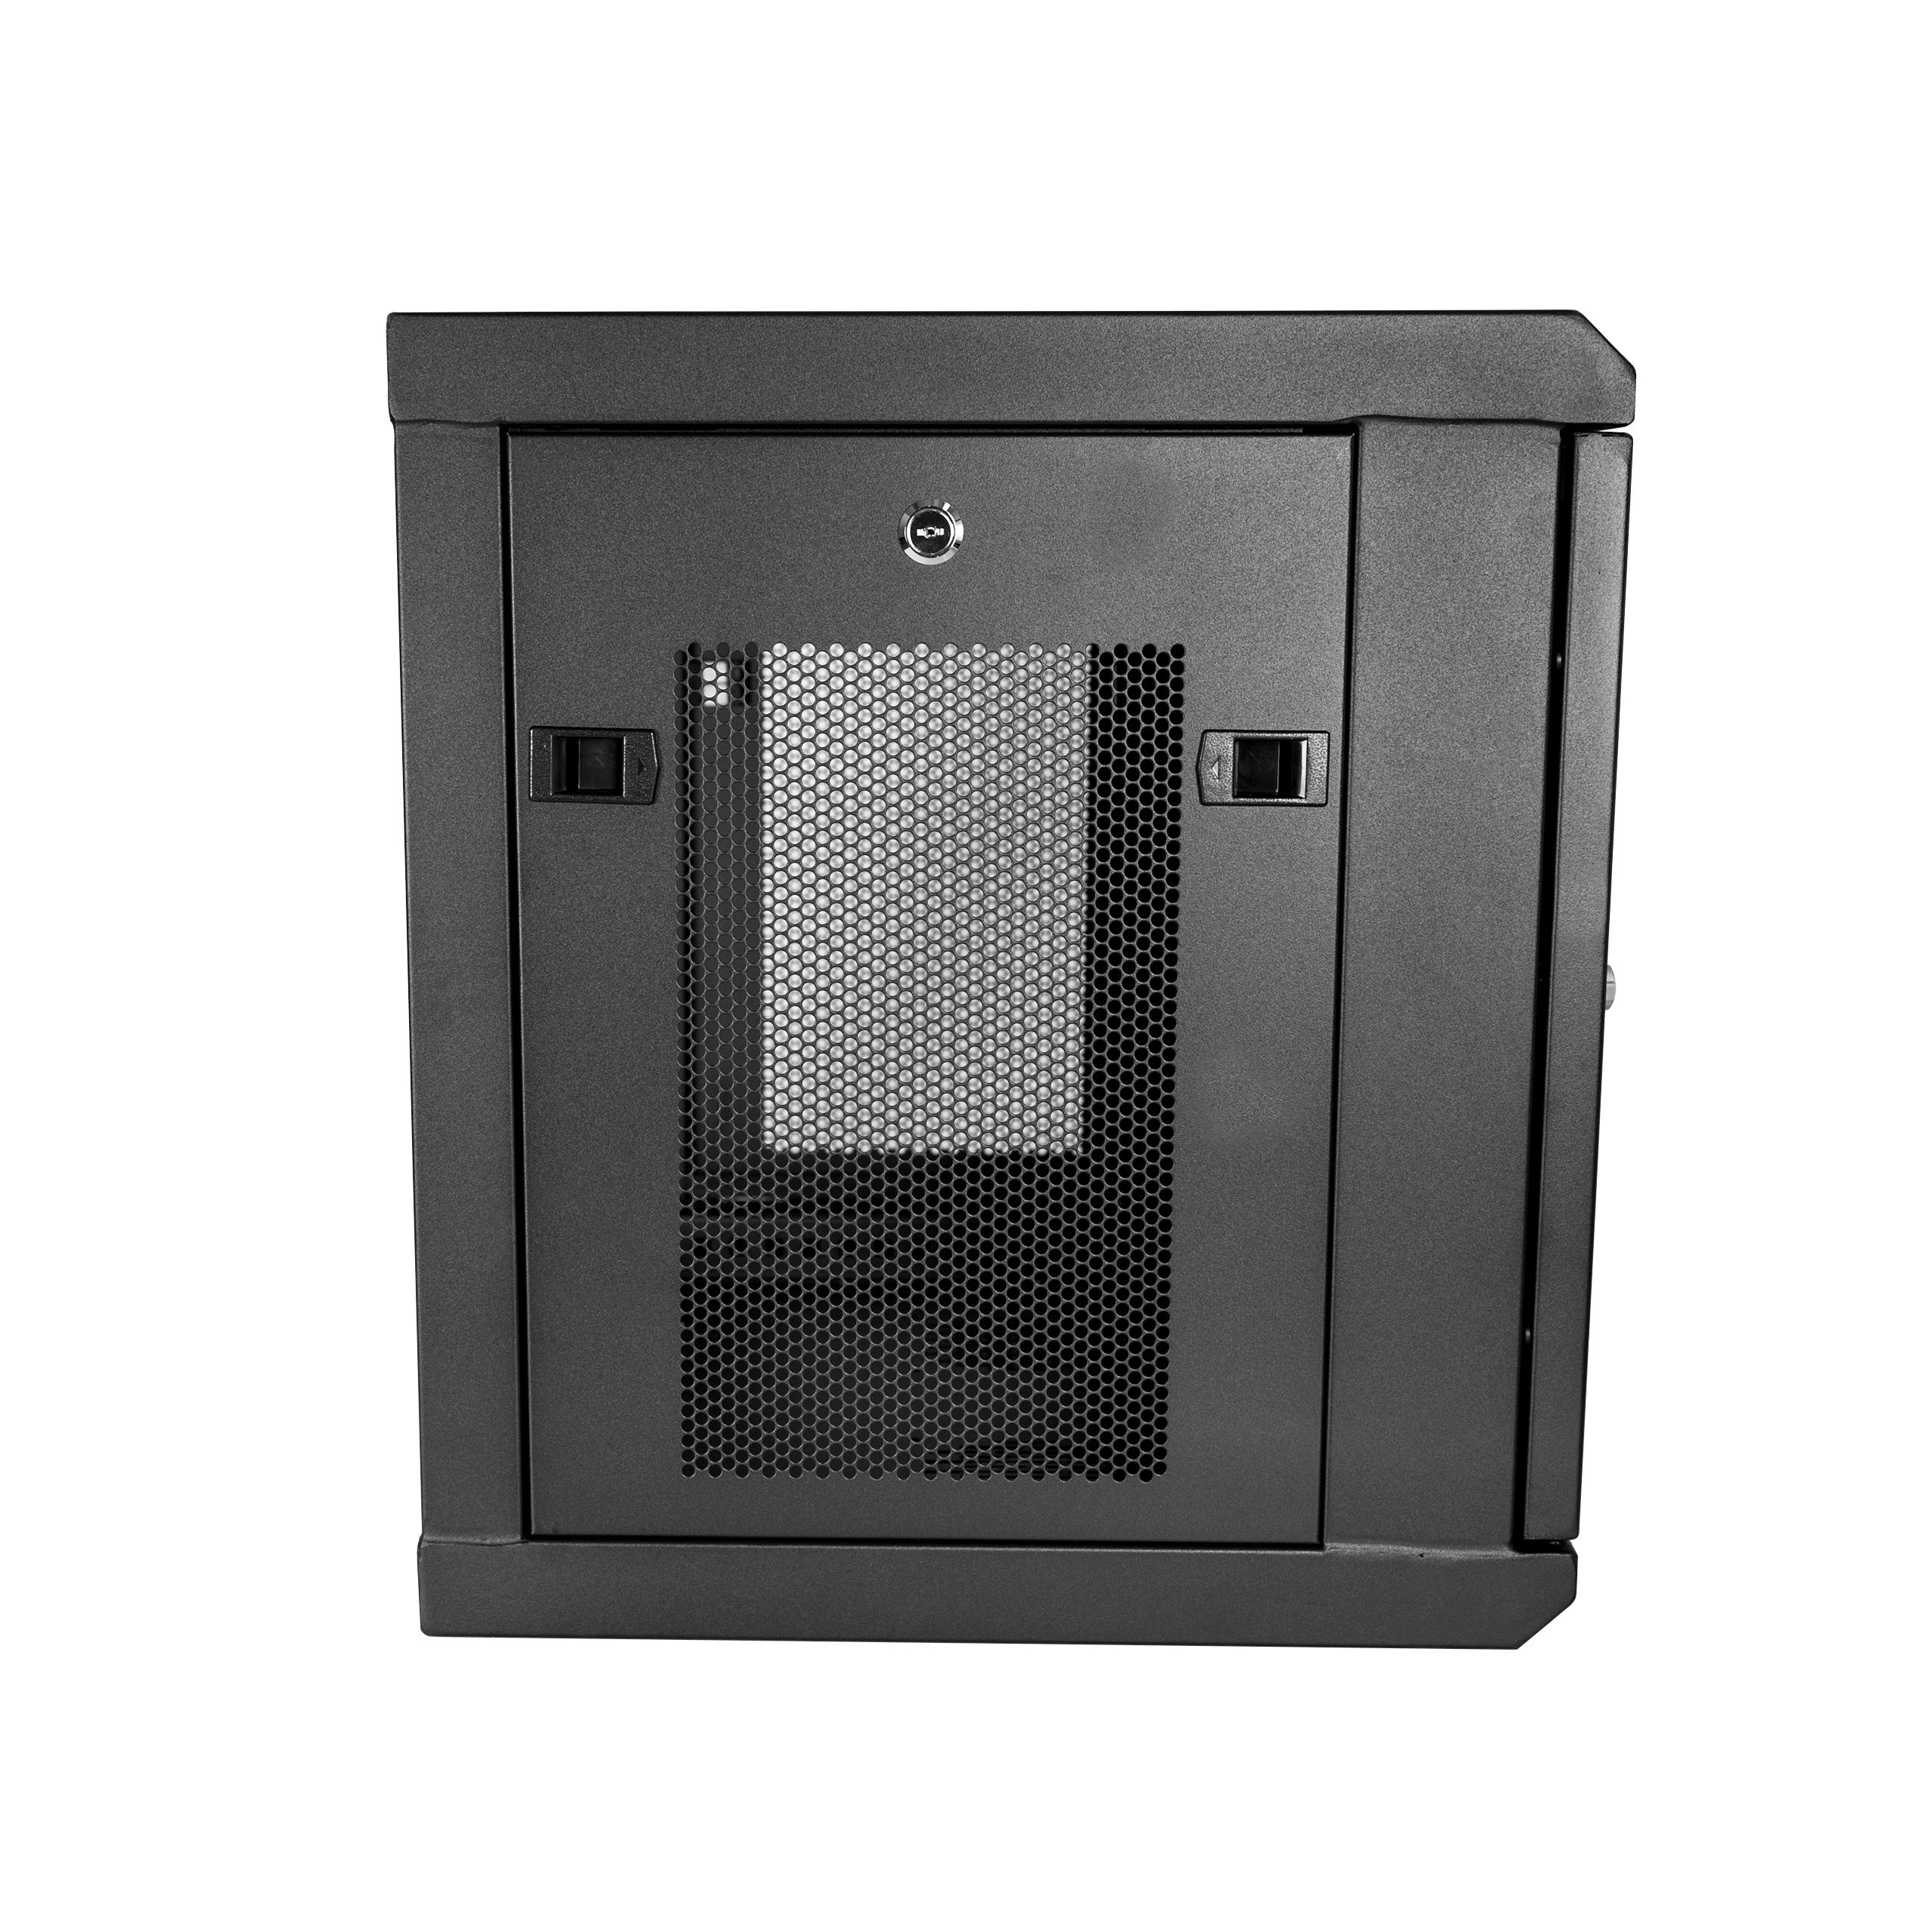 Startech Com Wall Mount Server Rack Cabinet 9u Rack 17